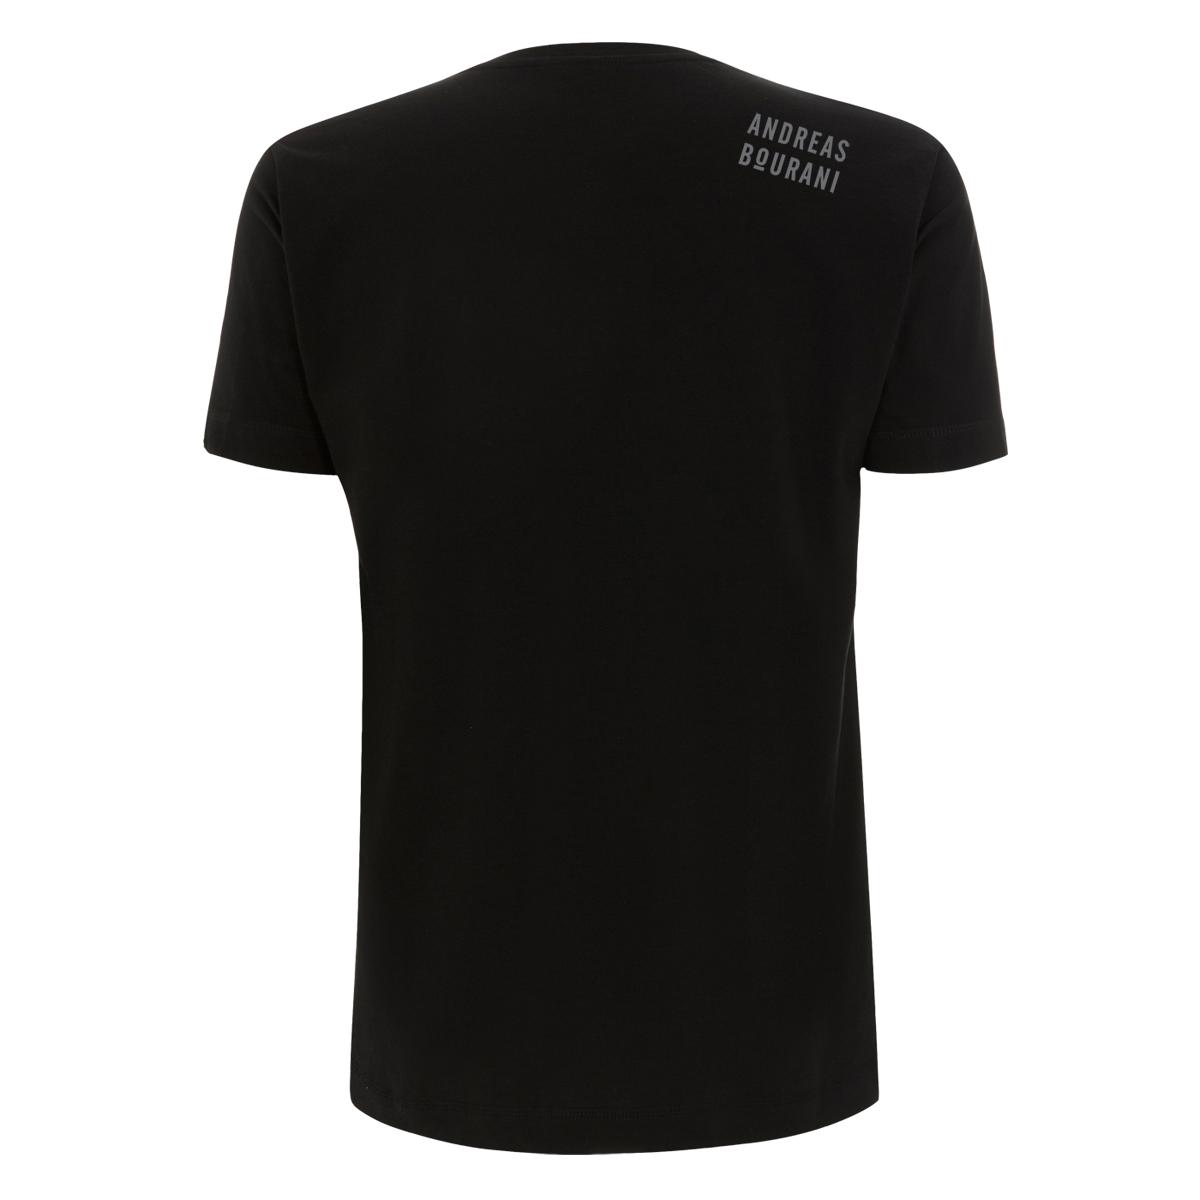 Andreas Bourani Diamant Regenbogen Shirt Herren T-Shirt schwarz